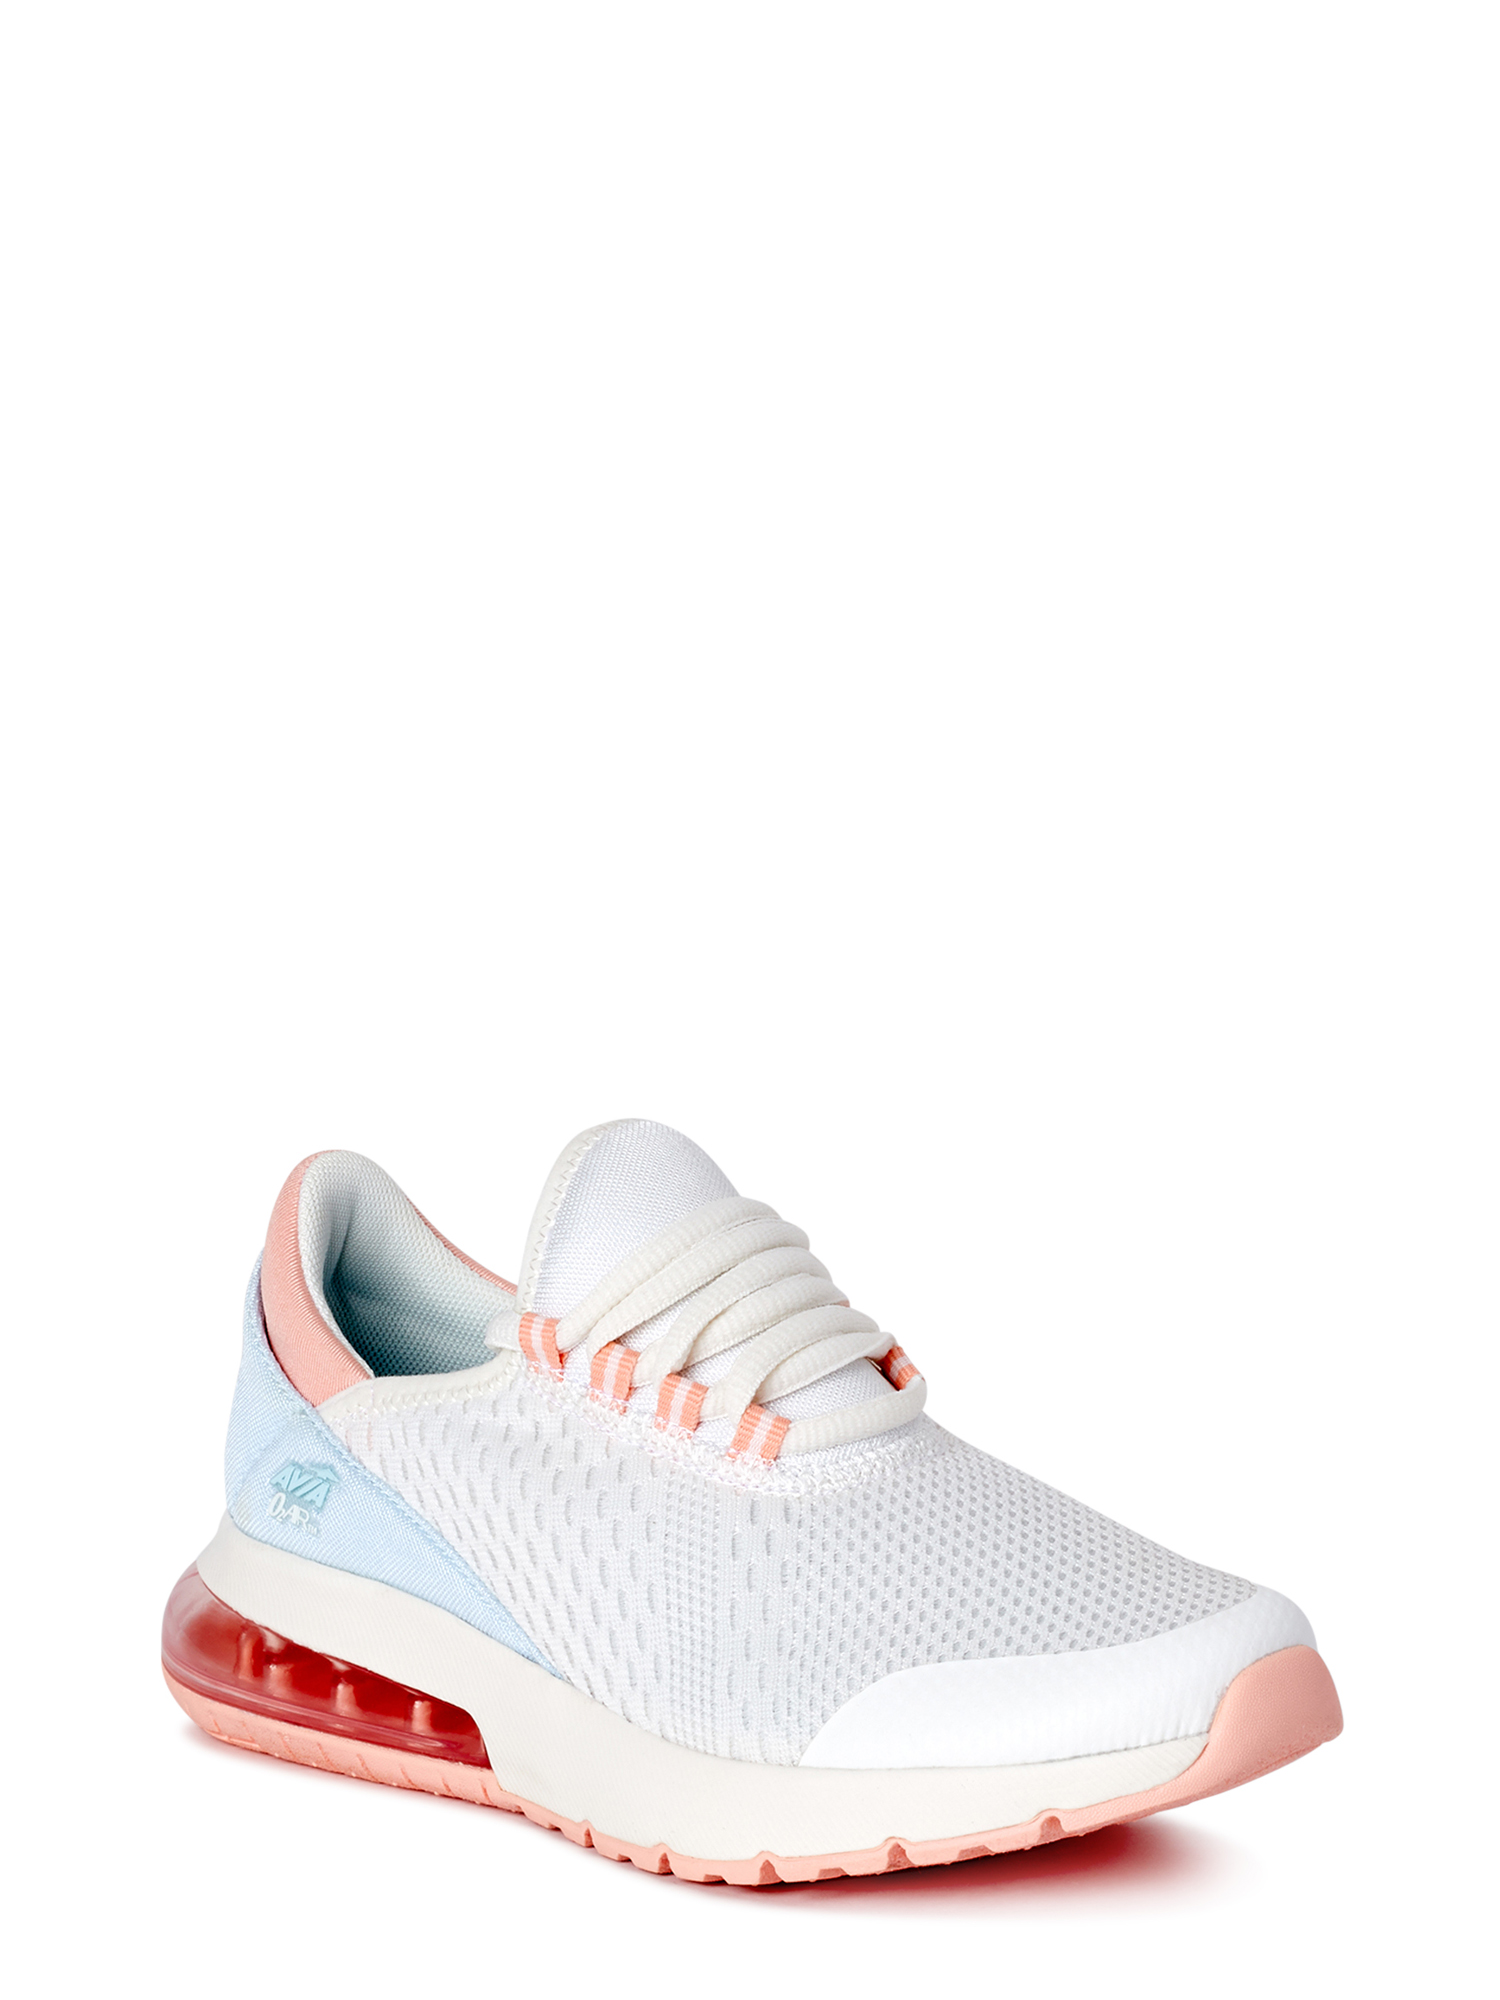 Avia - Women's Avia O2Air Athletic Shoe